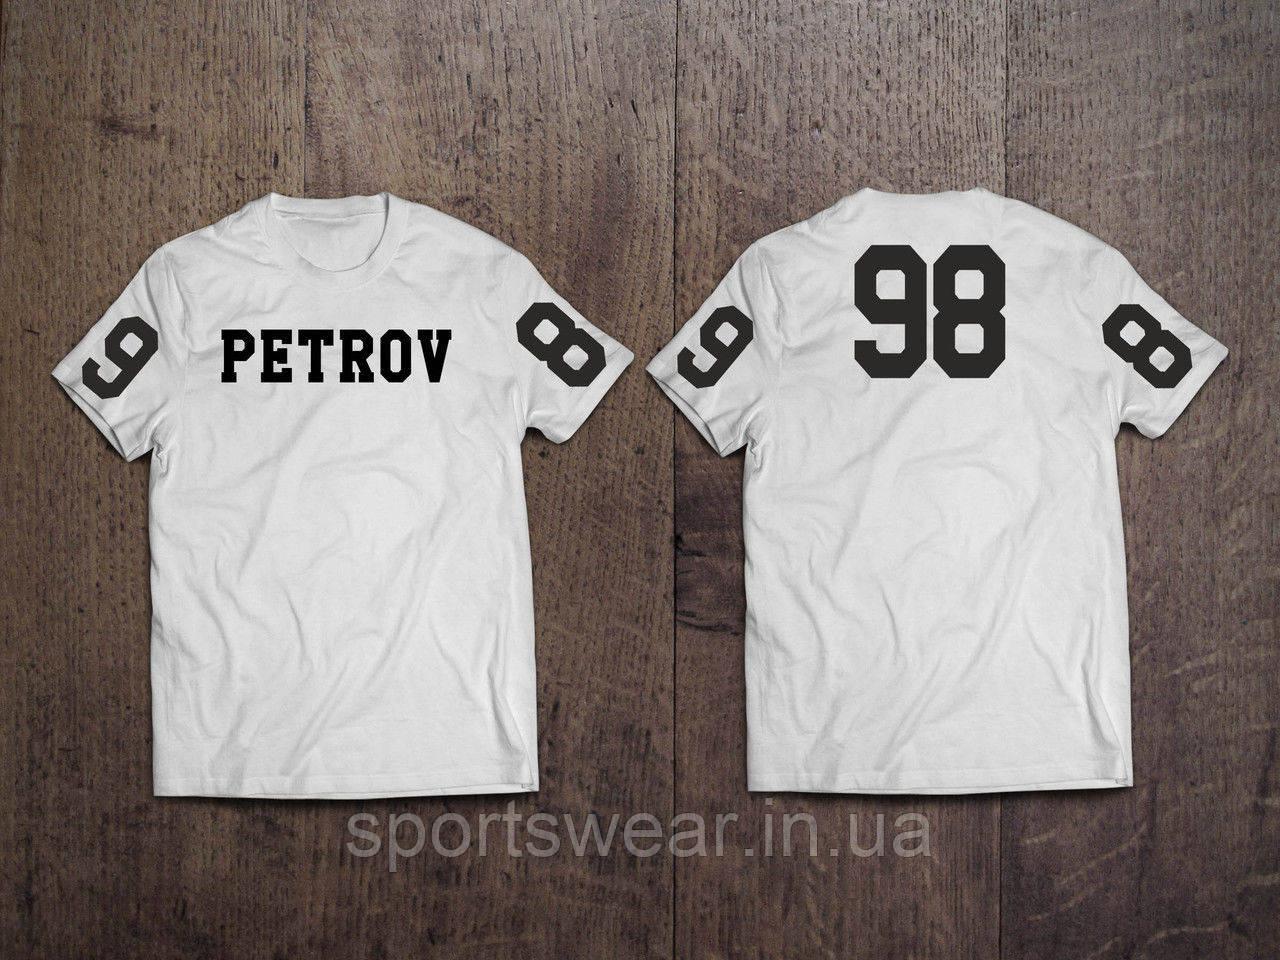 Мужская именная футболка ( Все ЦВЕТА ) №4 Белая